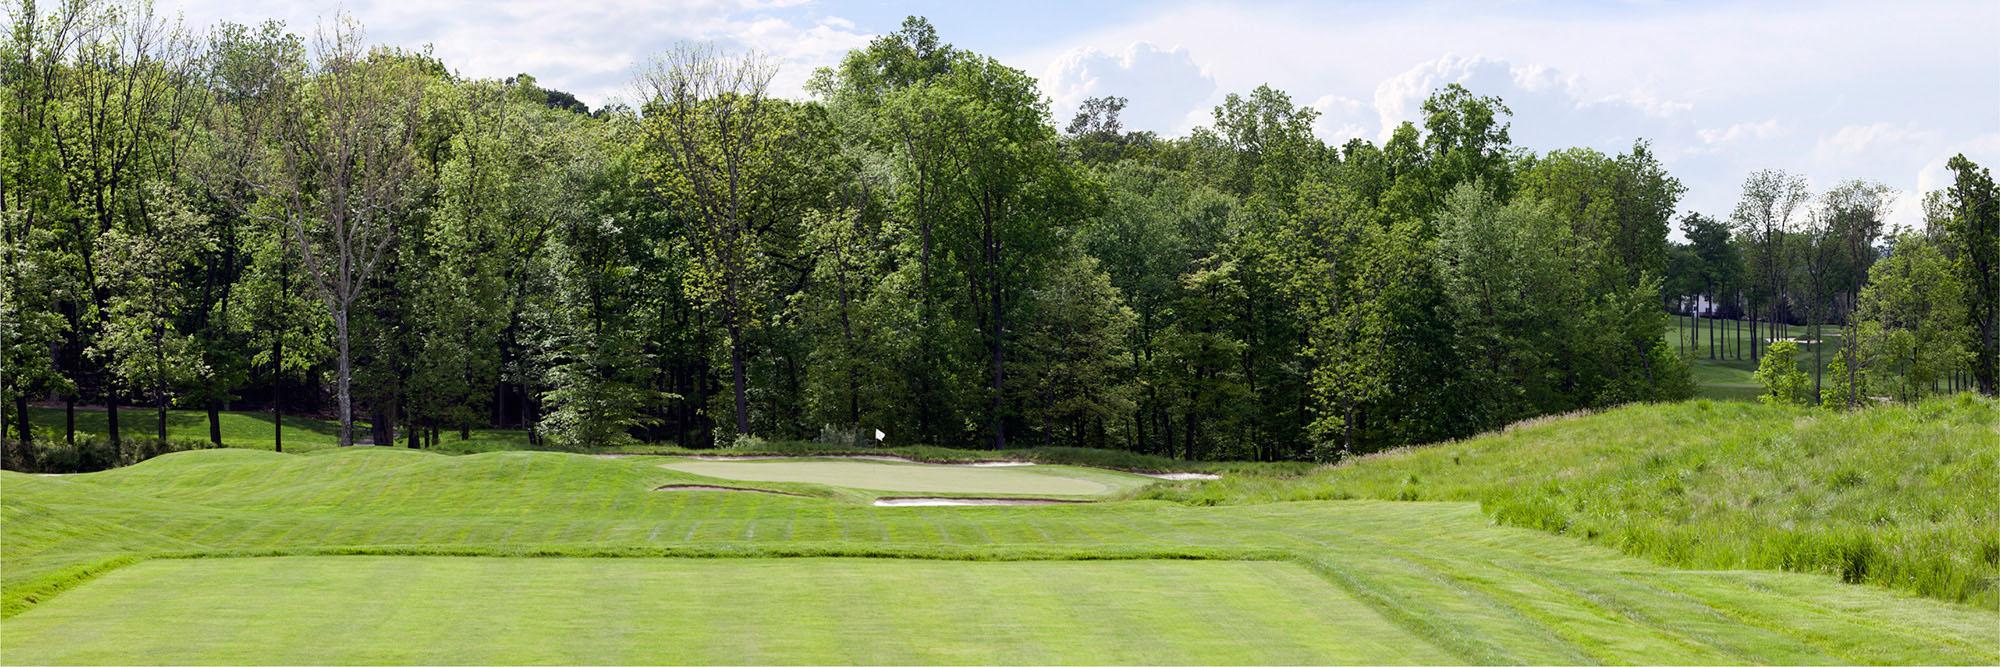 New Jersey National Golf Club